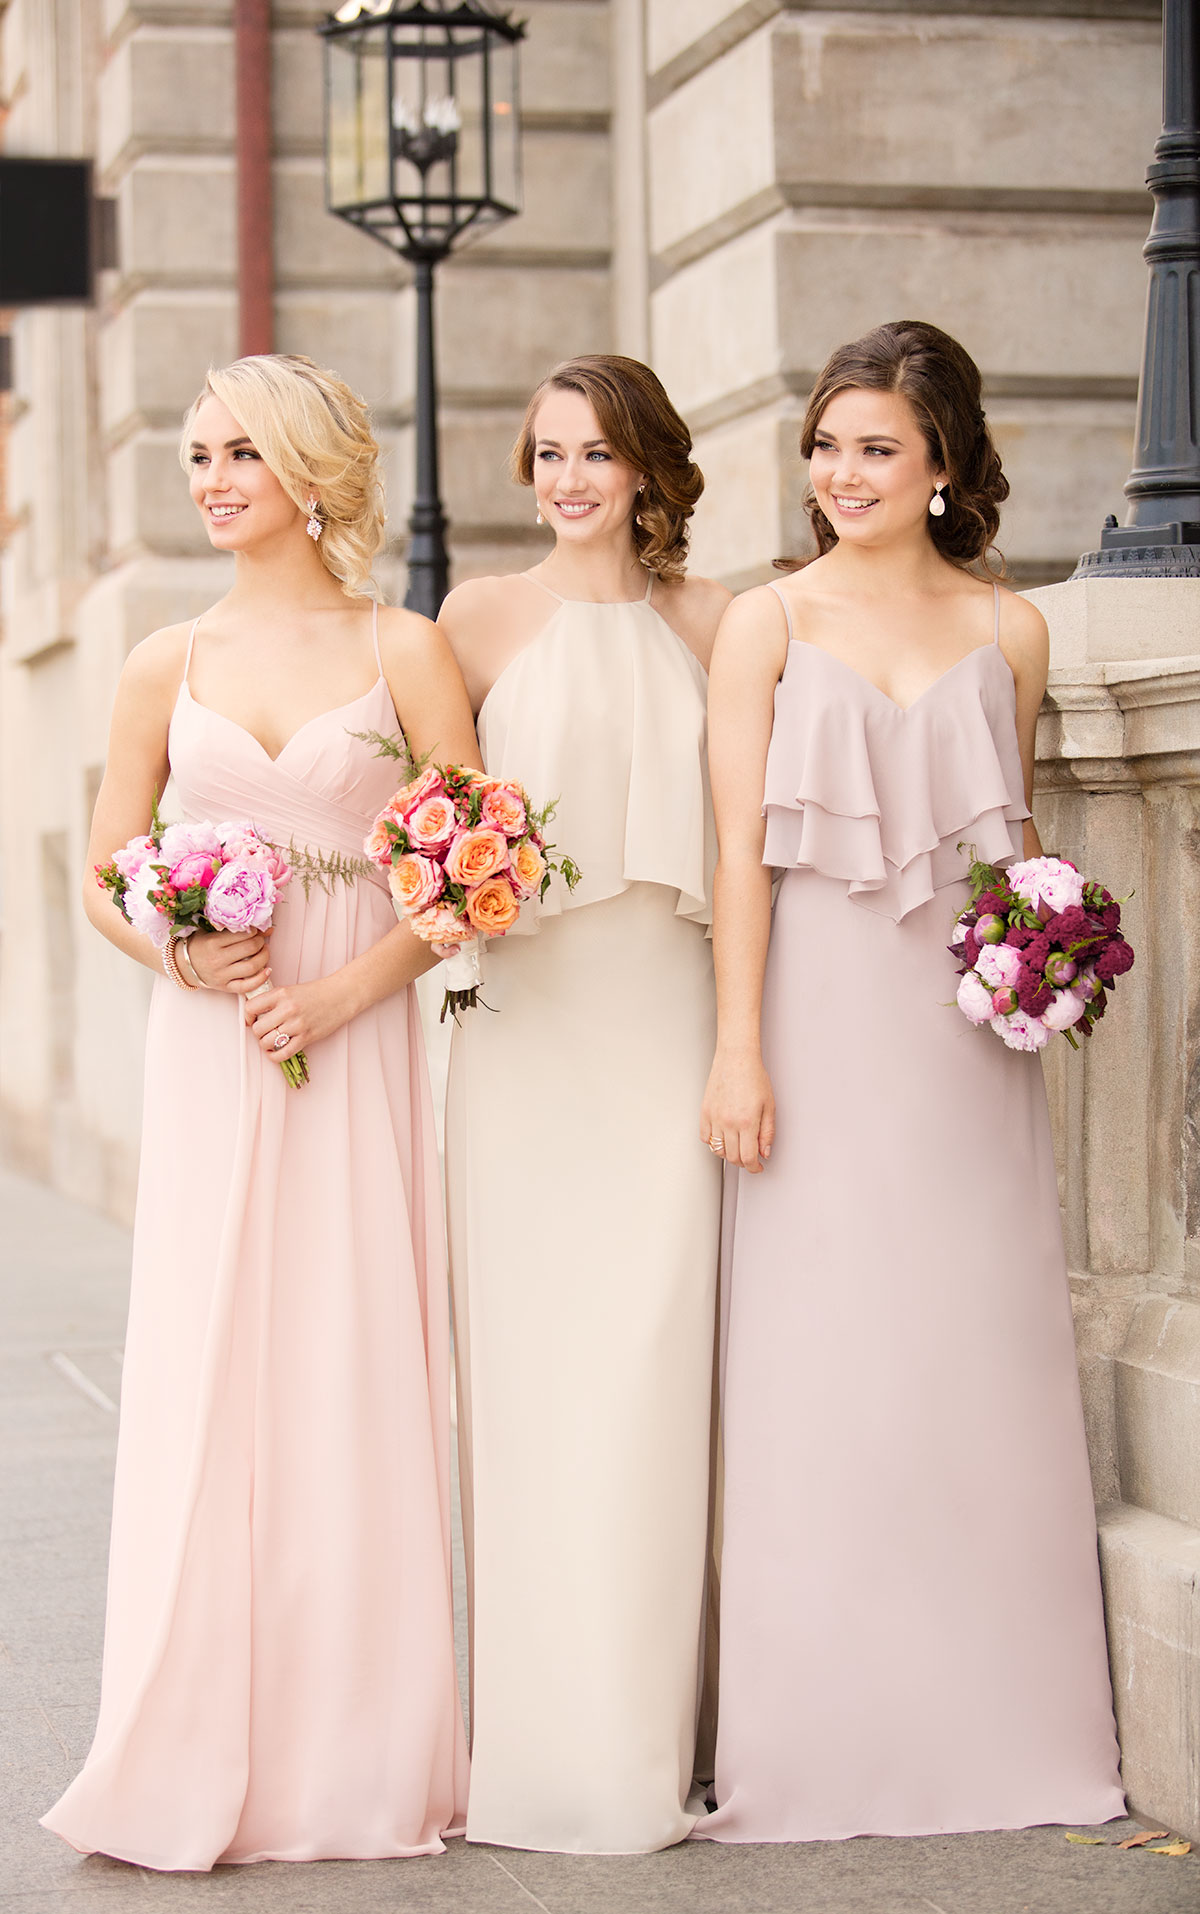 8b9554c497a Sorella Vita Sequin Bridesmaid Dresses Uk - Gomes Weine AG